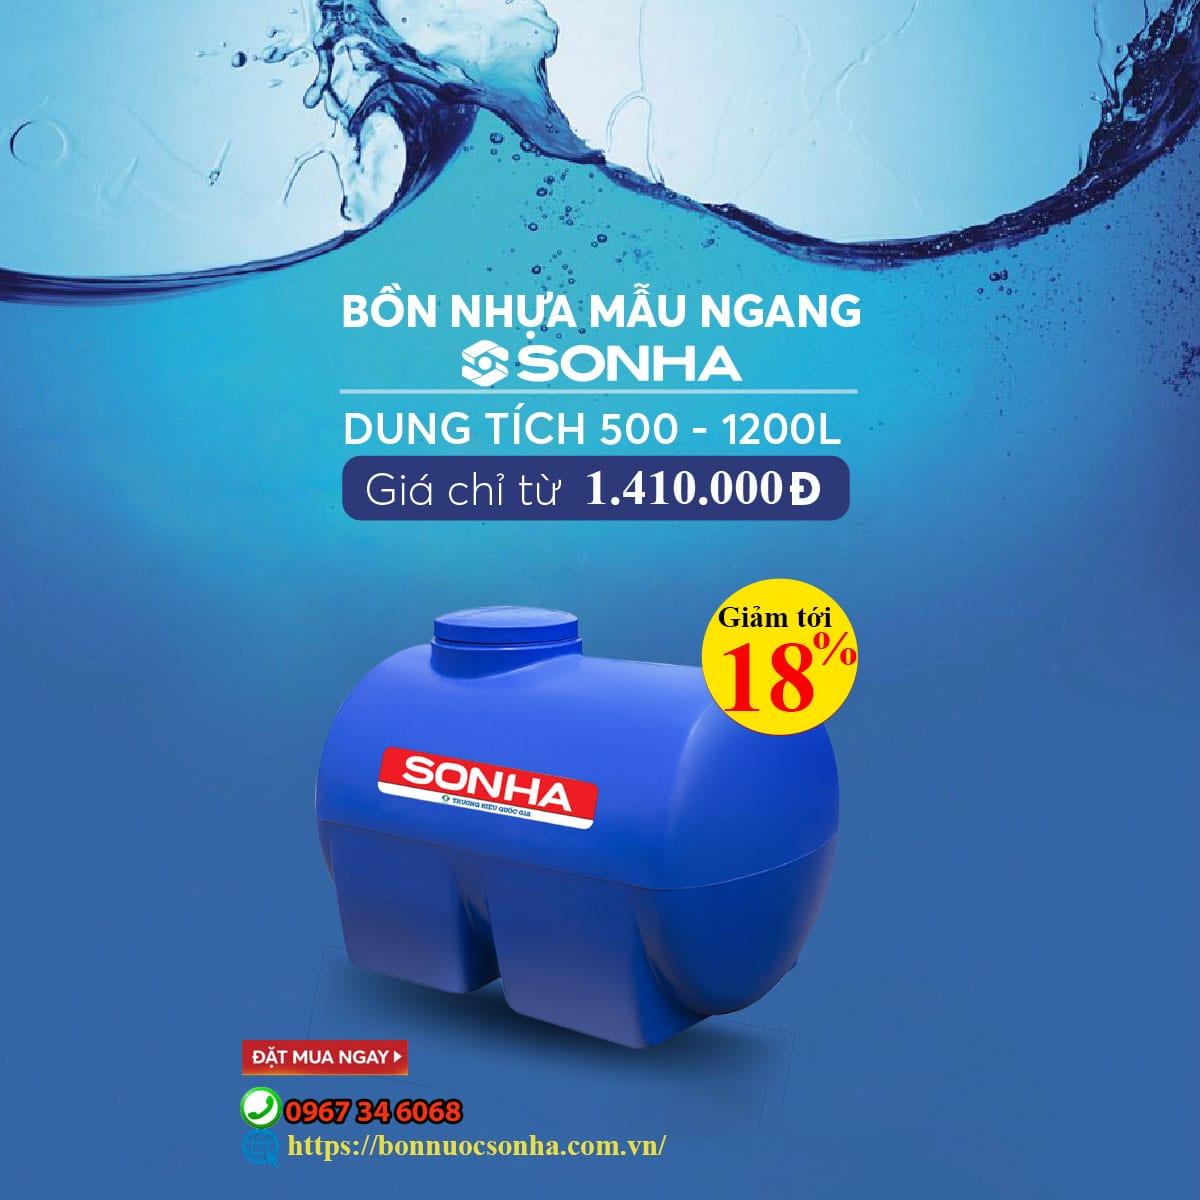 Bon Nhua Mau Ngang Min